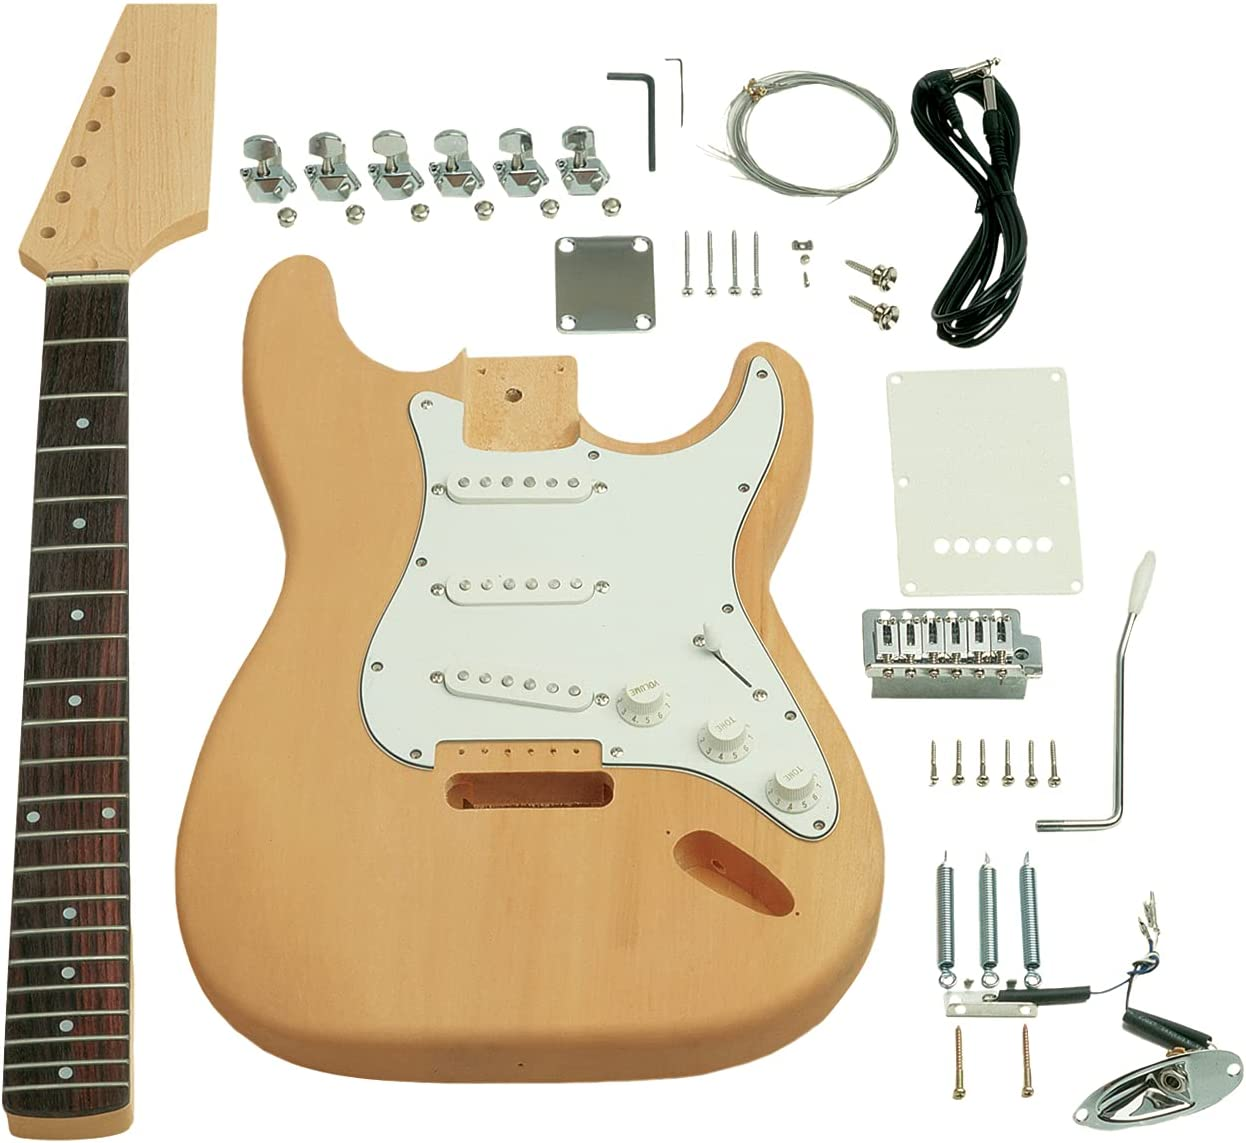 Saga Popular overseas ST-10 Popular overseas Electric Guitar - Style S Kit